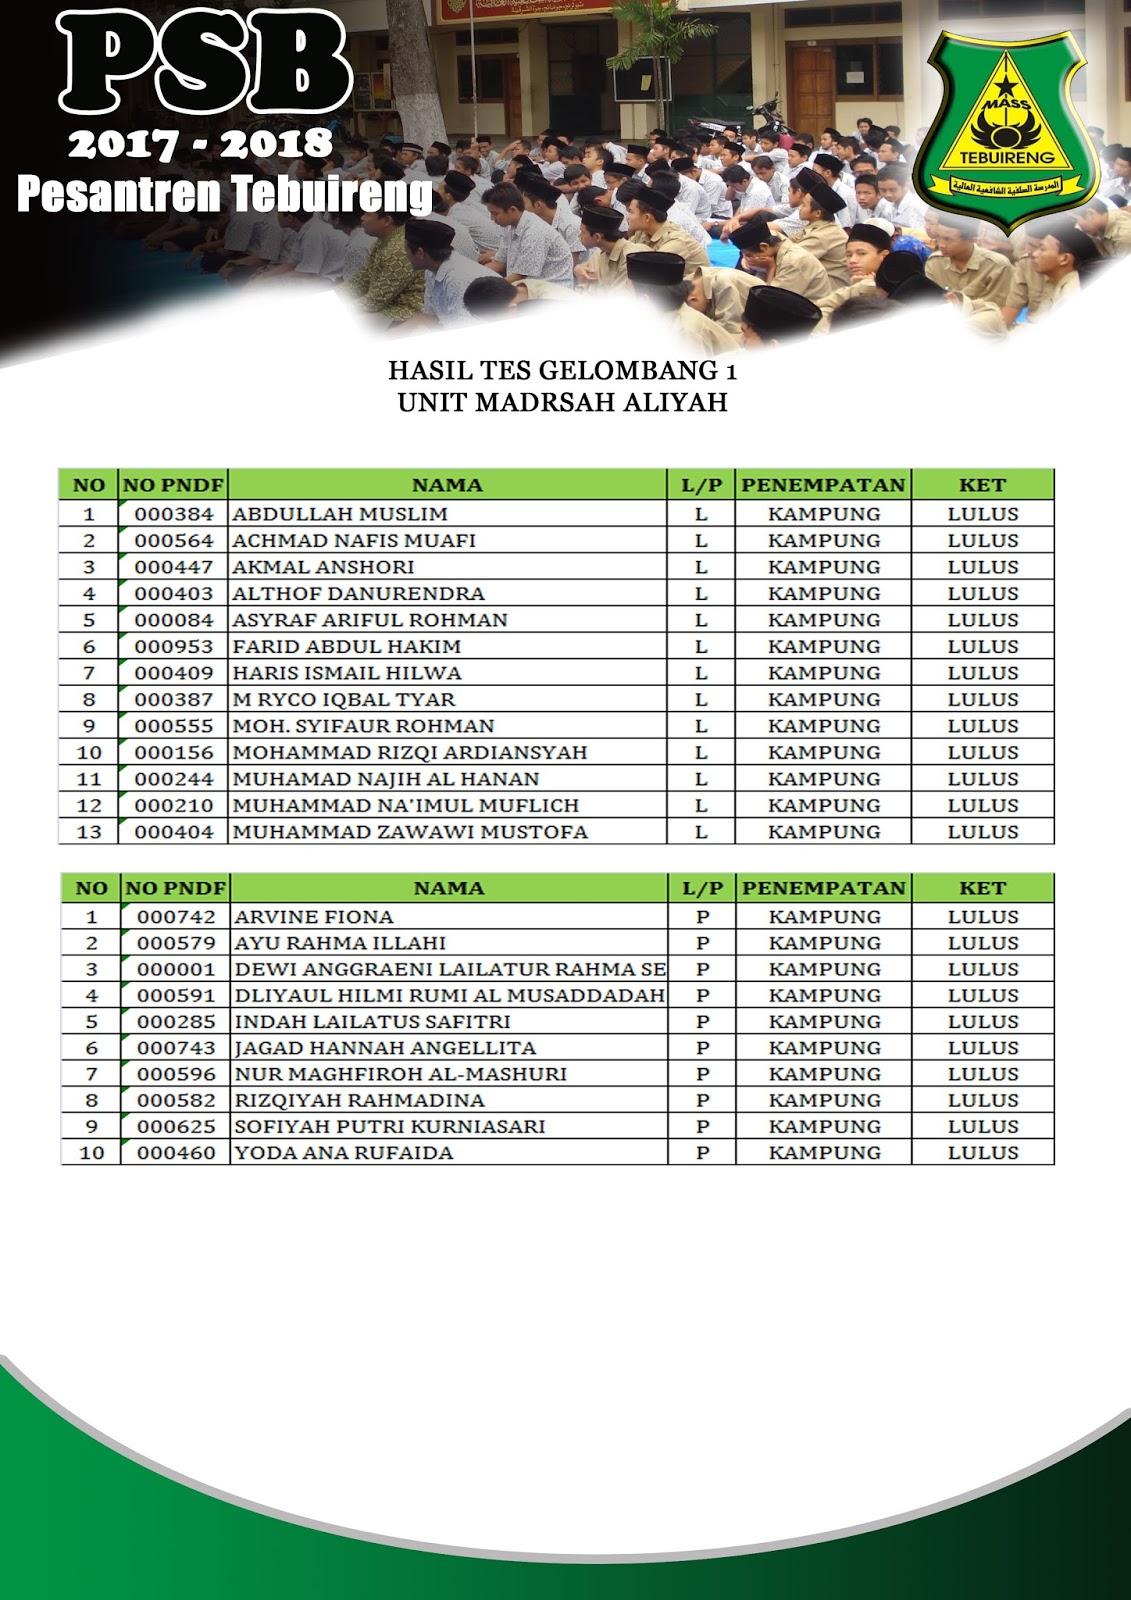 Madrasah Aliyah Putra-Putri Non-Asrama